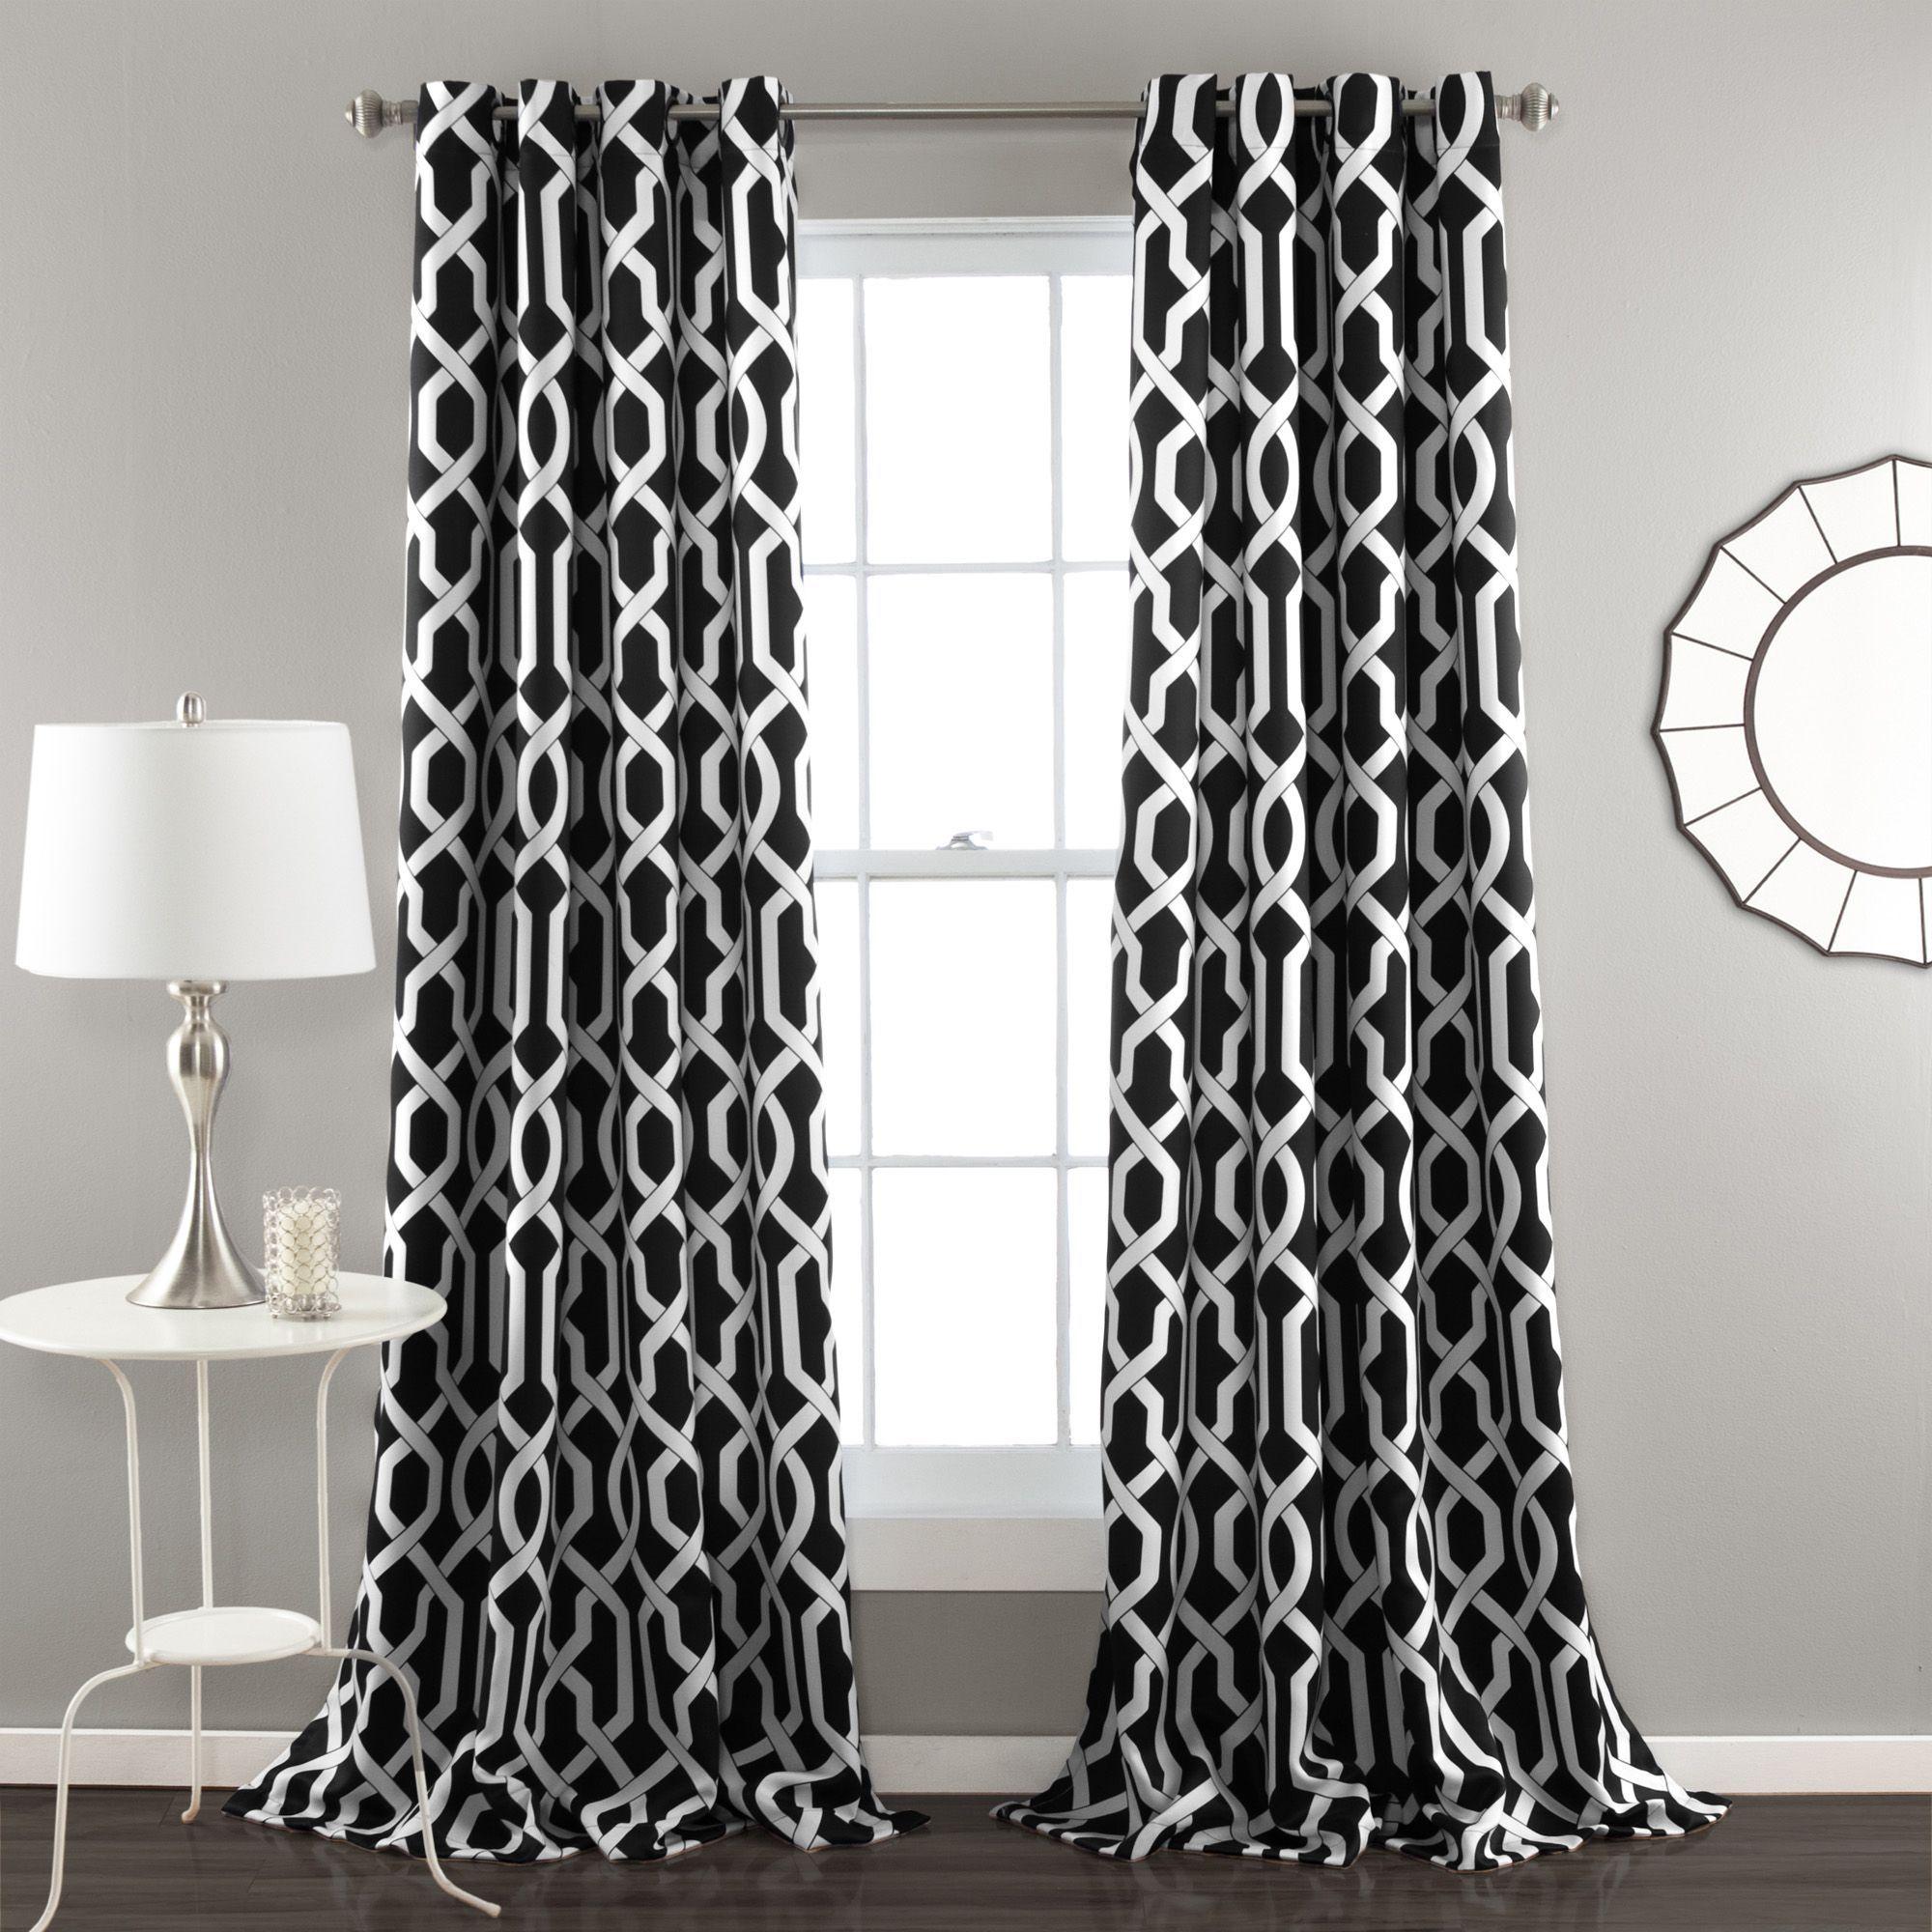 Window coverings for 2 story windows  fingerhut  lush decor edward room darkening